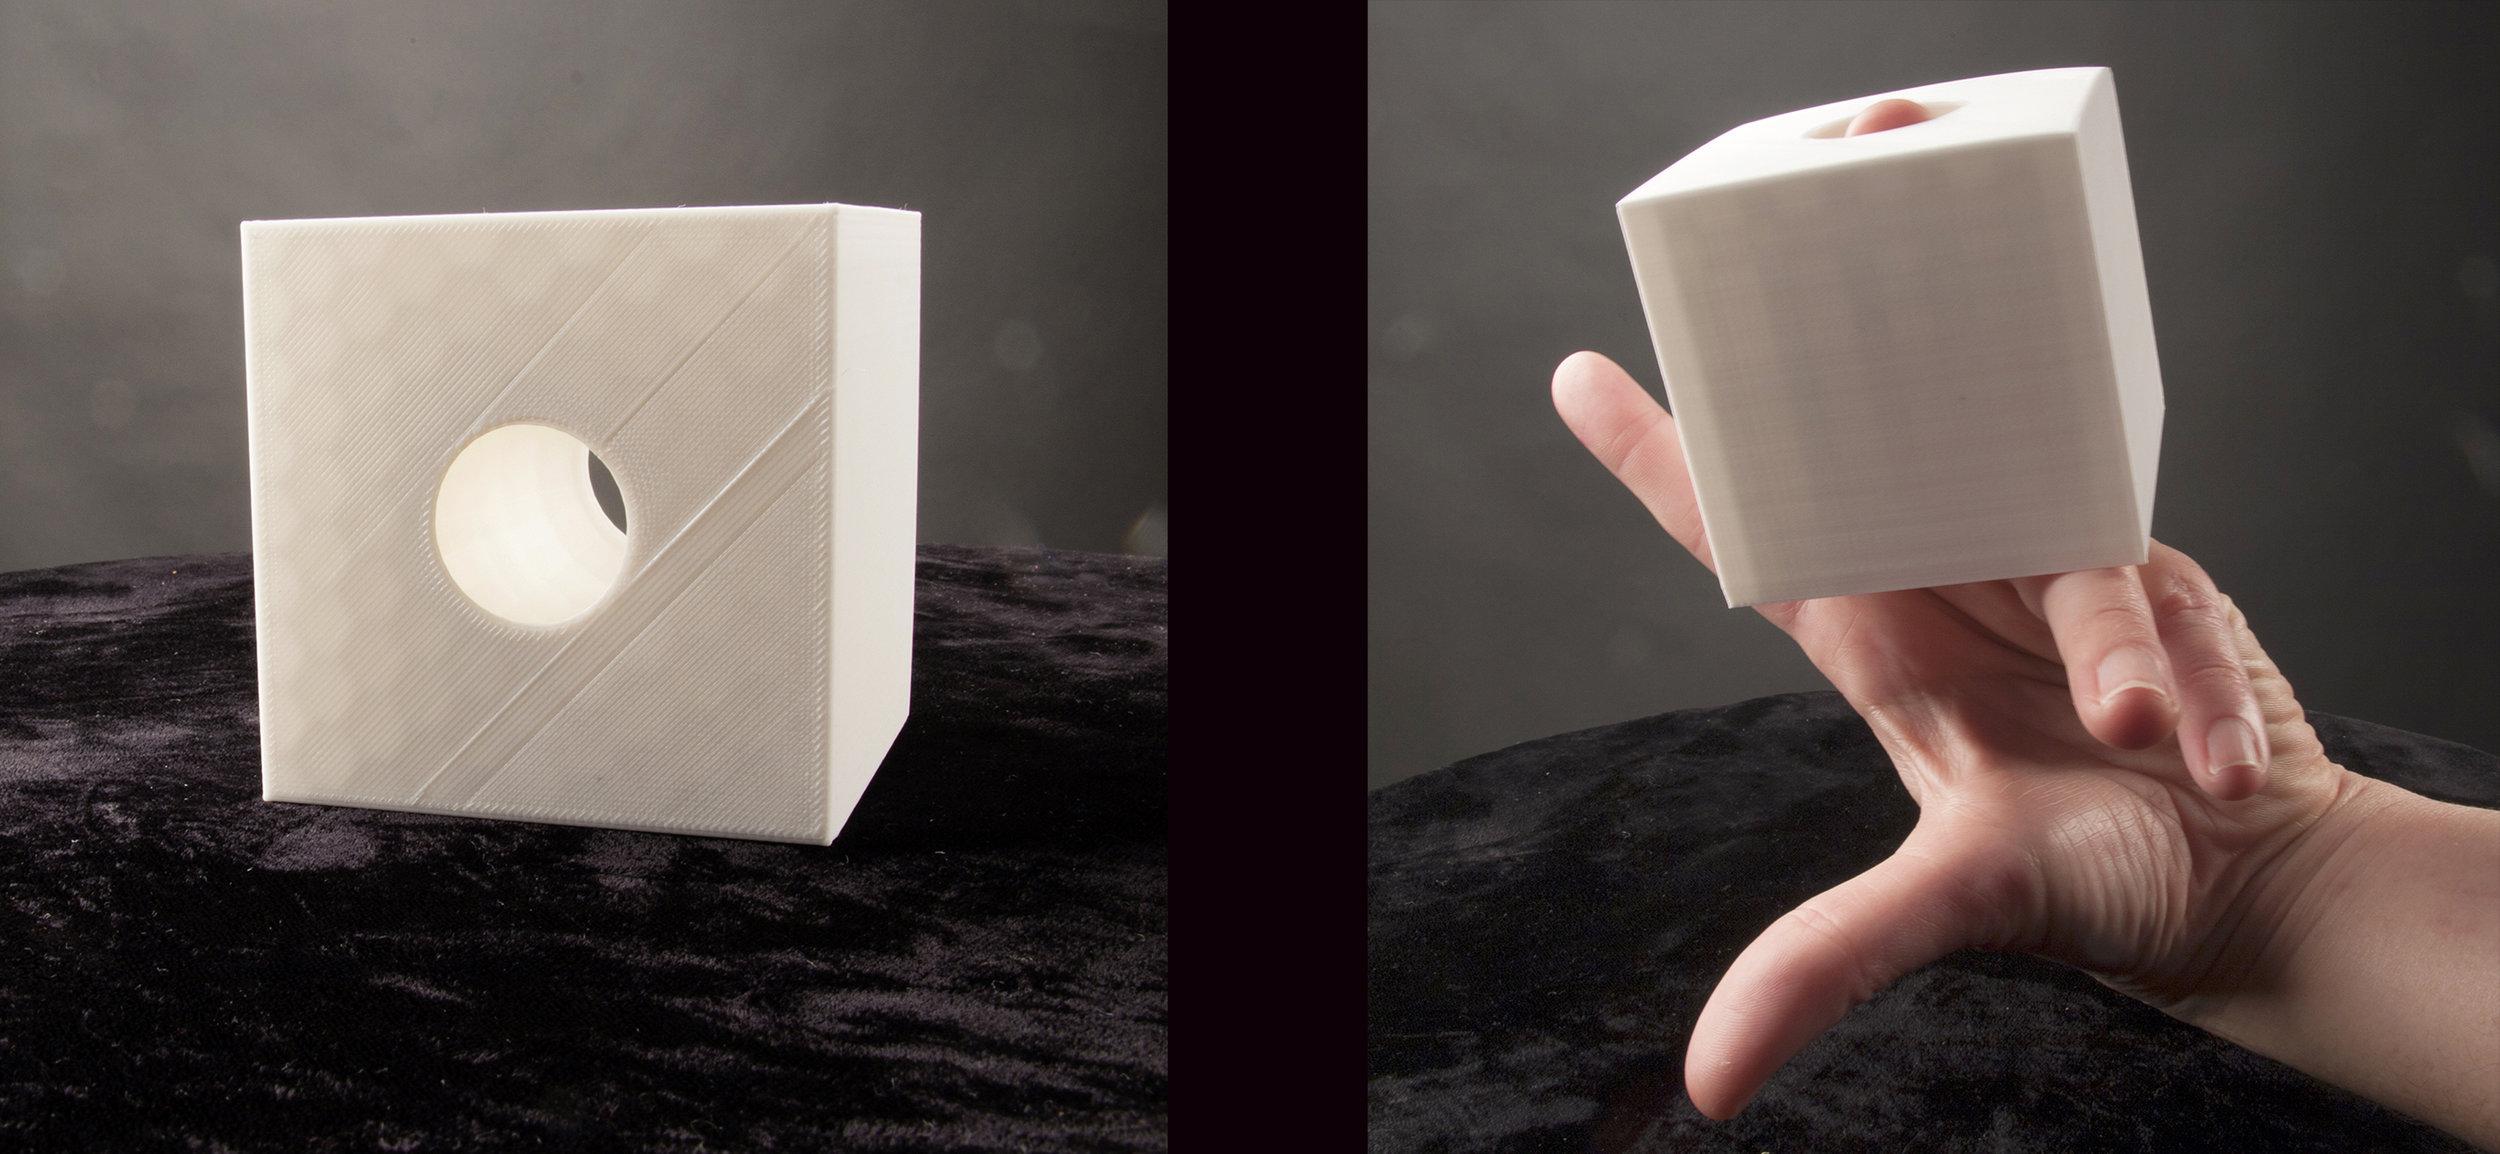 Sarah Seiber-box ring with interior egg form.jpg